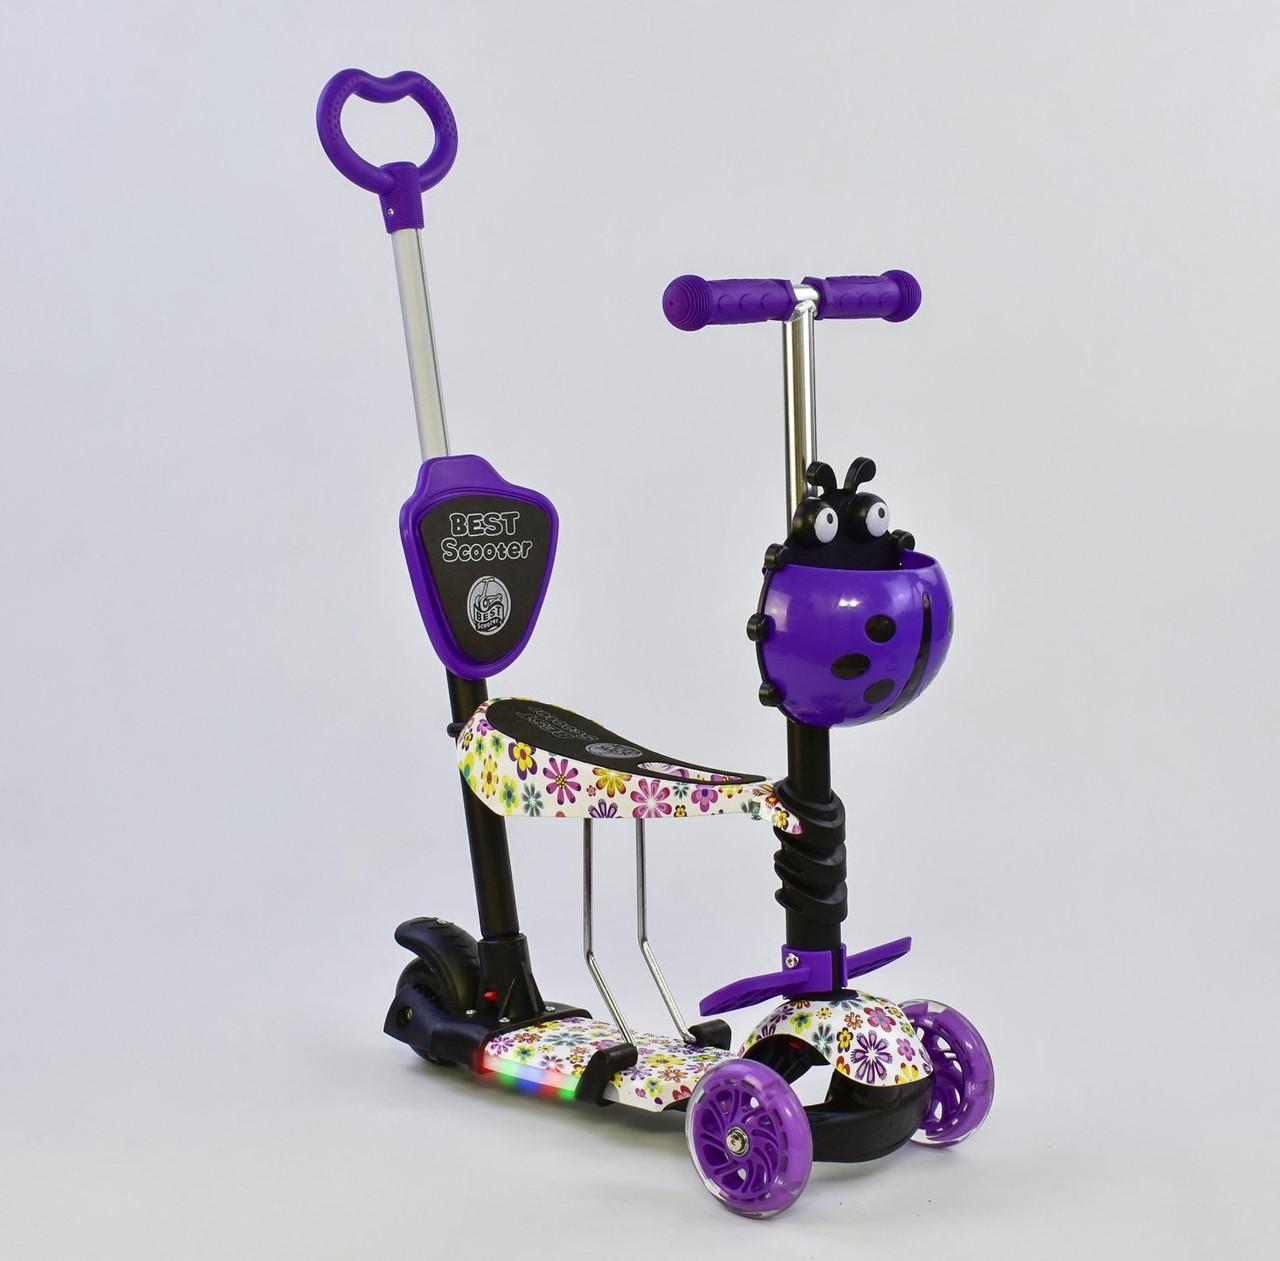 Best Scooter Самокат 5 в 1 Best Scooter Flowers 69070 Purple (69070)